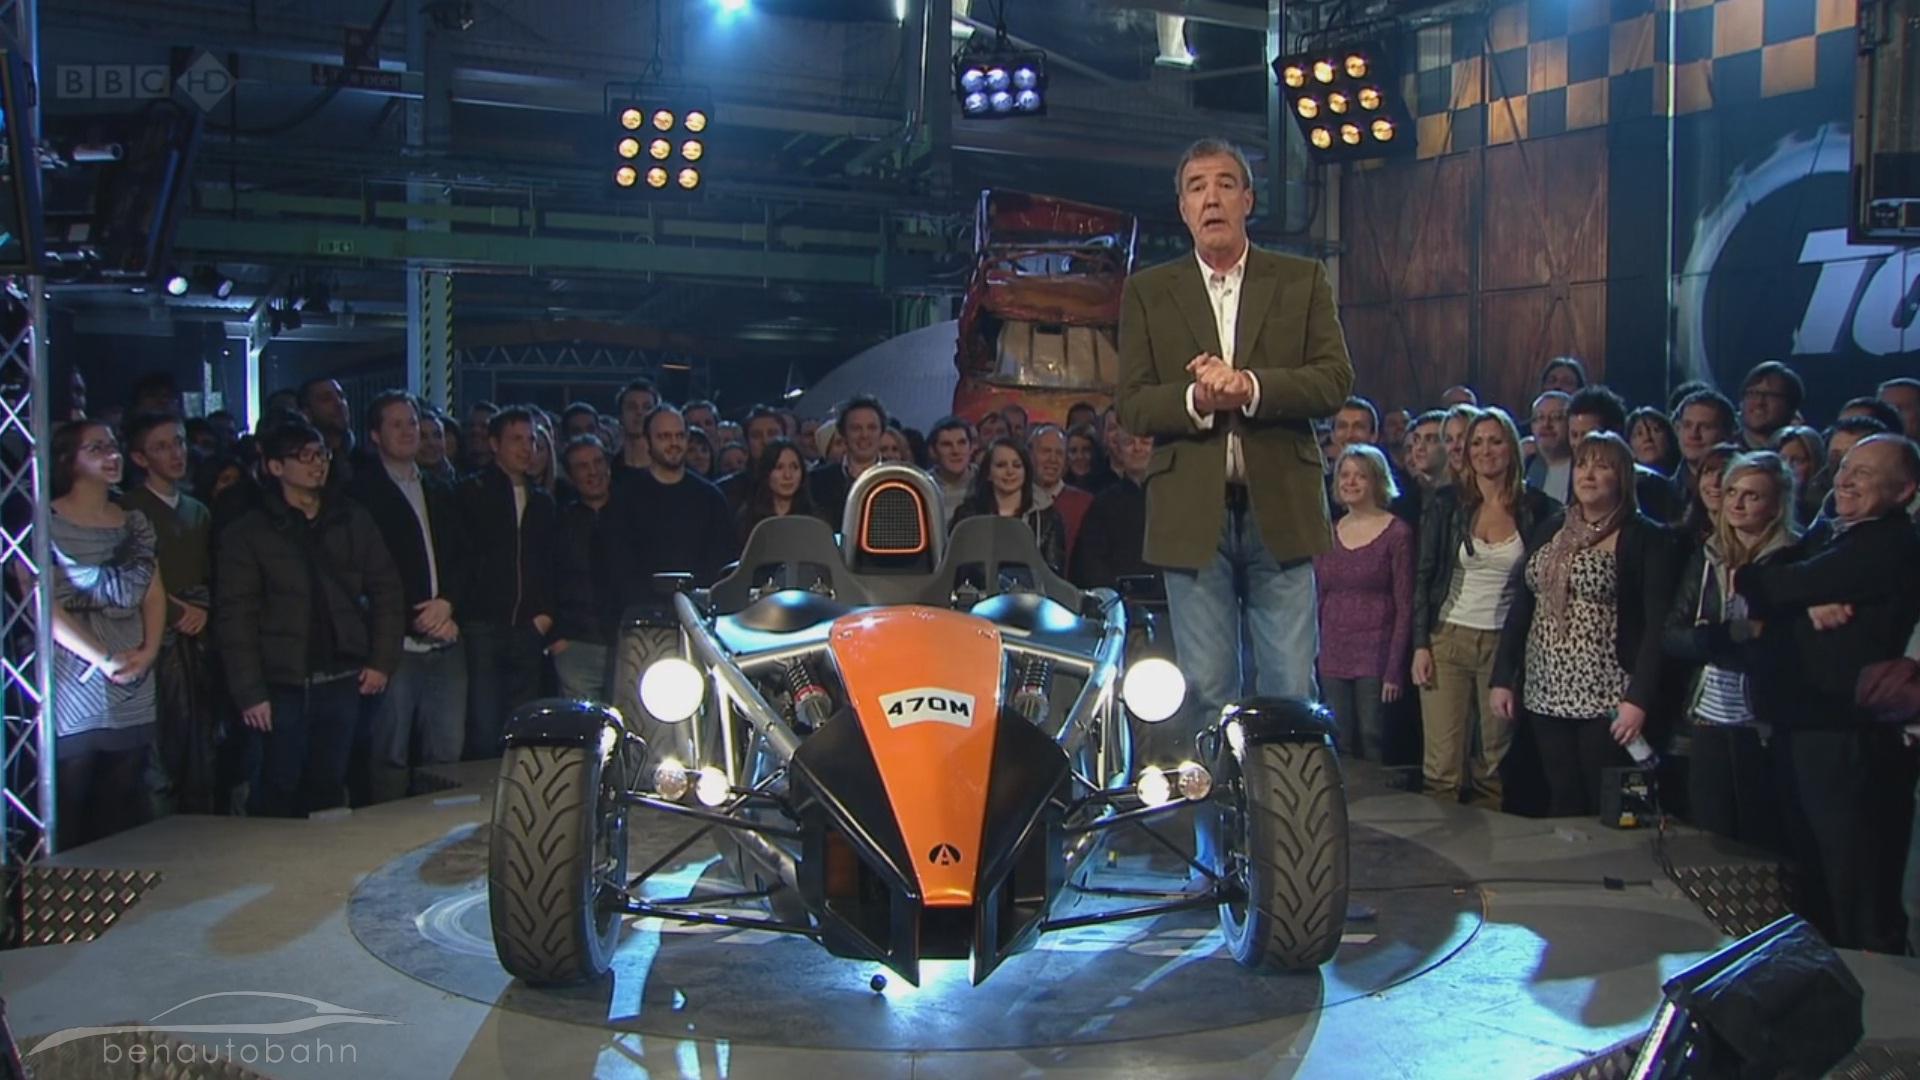 Top Gear Season 16 Episode 1 review – BenAutobahn